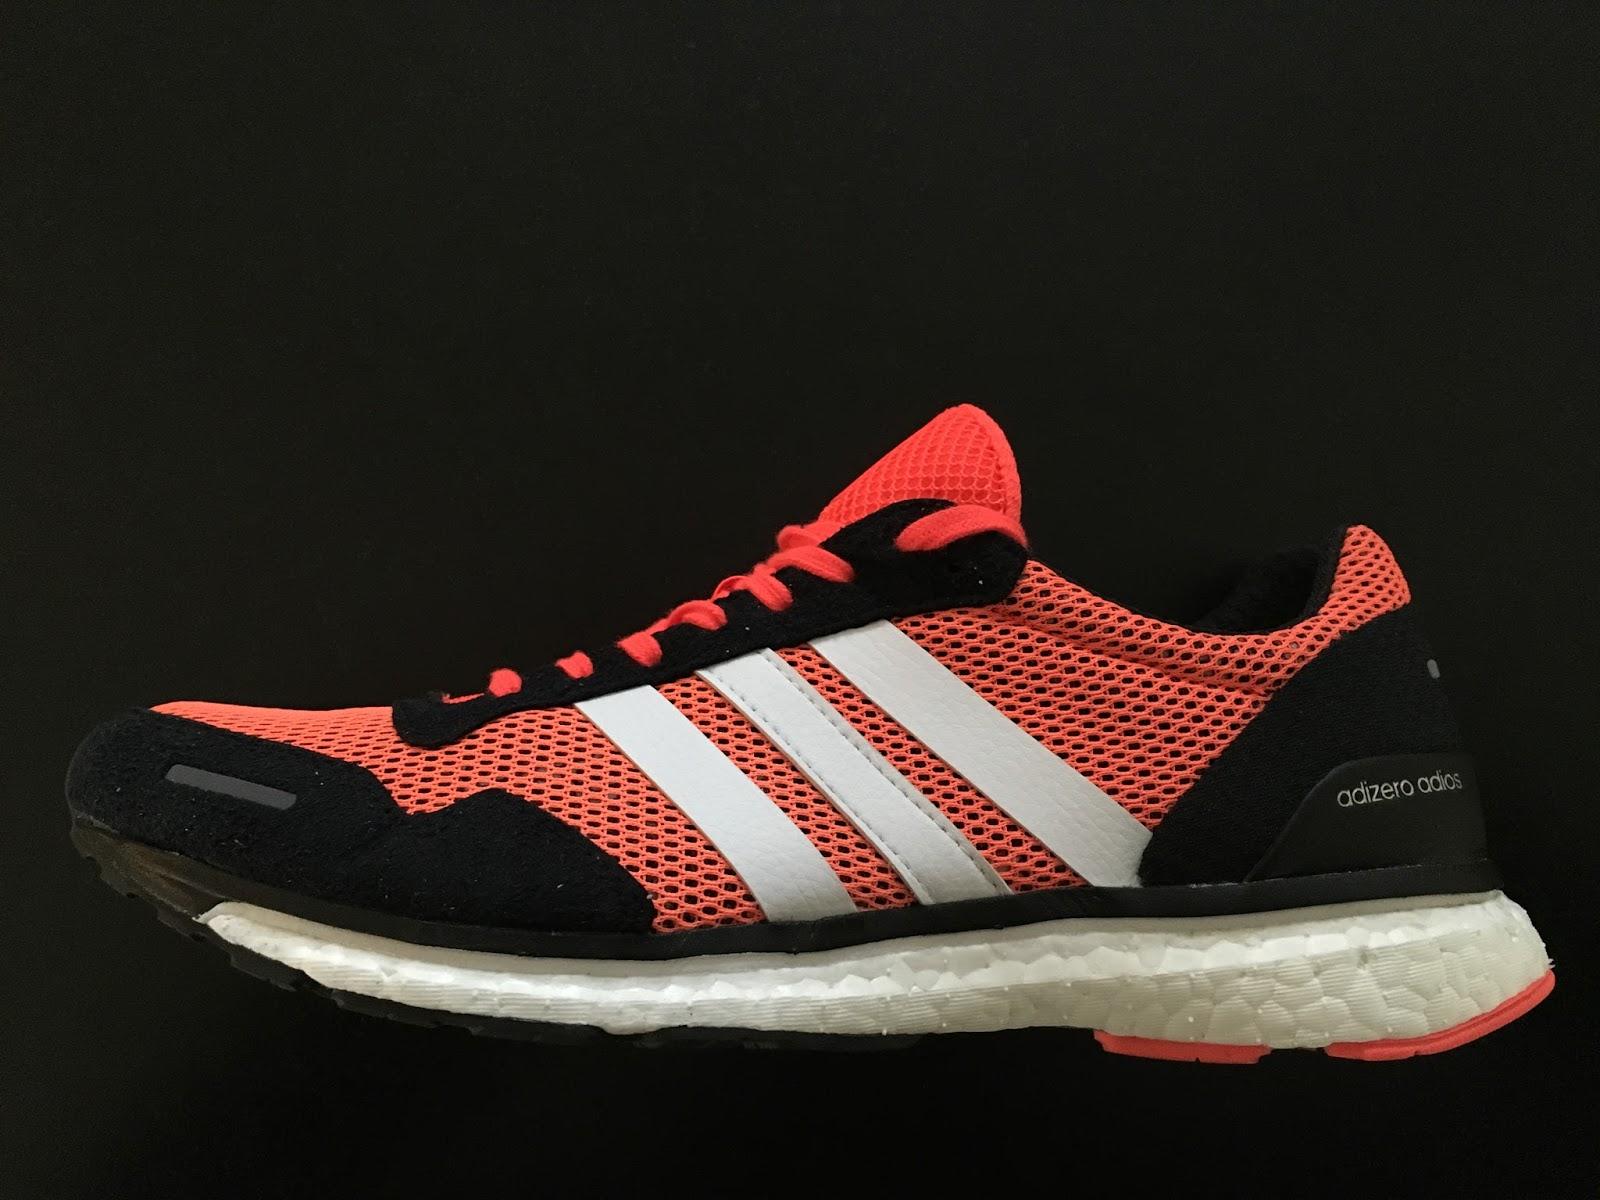 Impulso 3 Hombres Adidas Adizero Adiós Zapatos Rojo / Blanco bSgvXDQ8Us